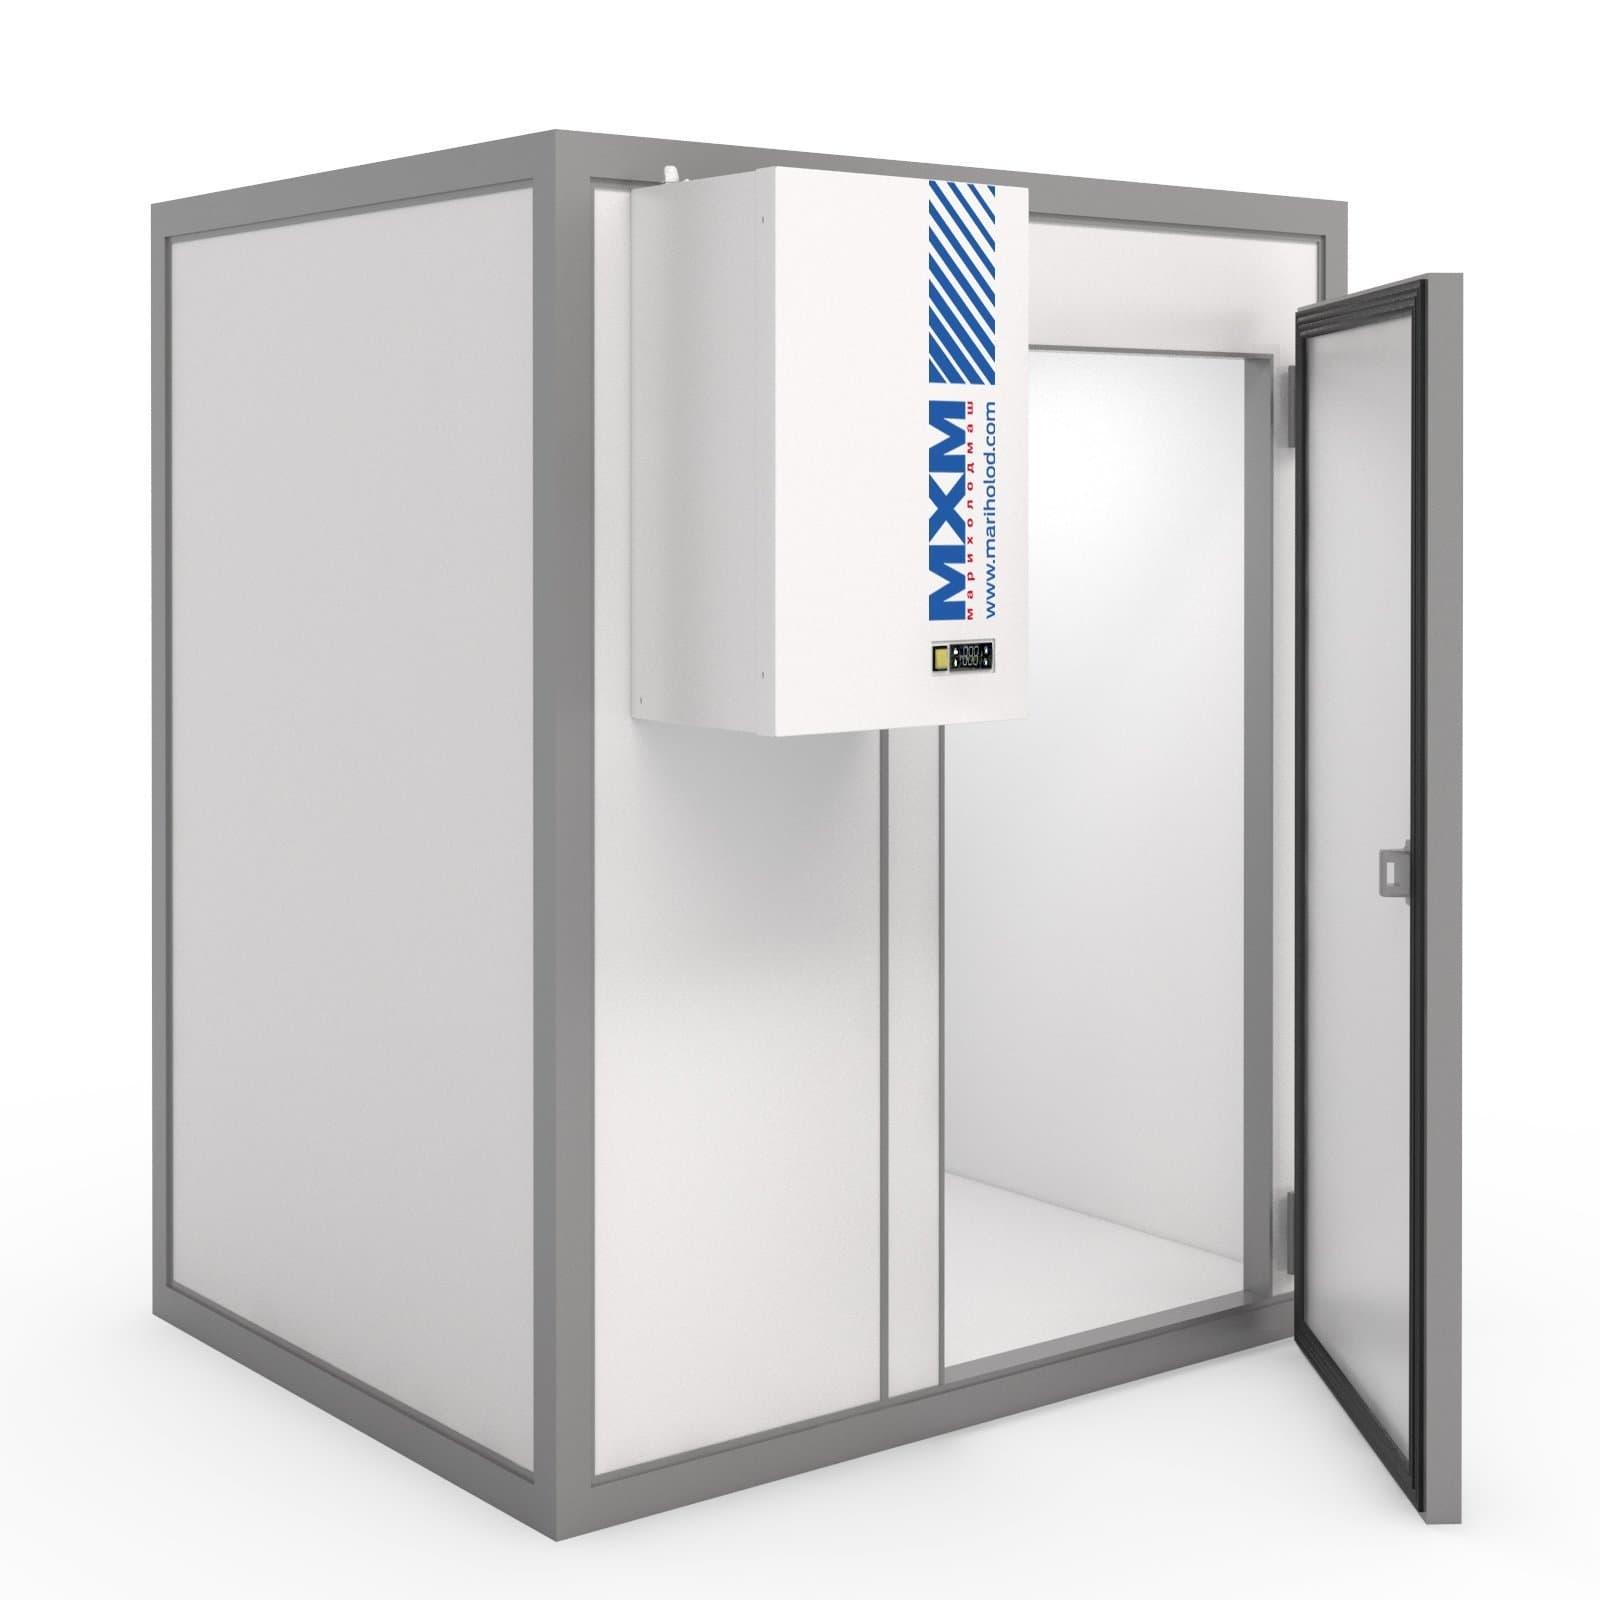 Камера холодильная МХМ КХН-11,52 1660×3160×2720